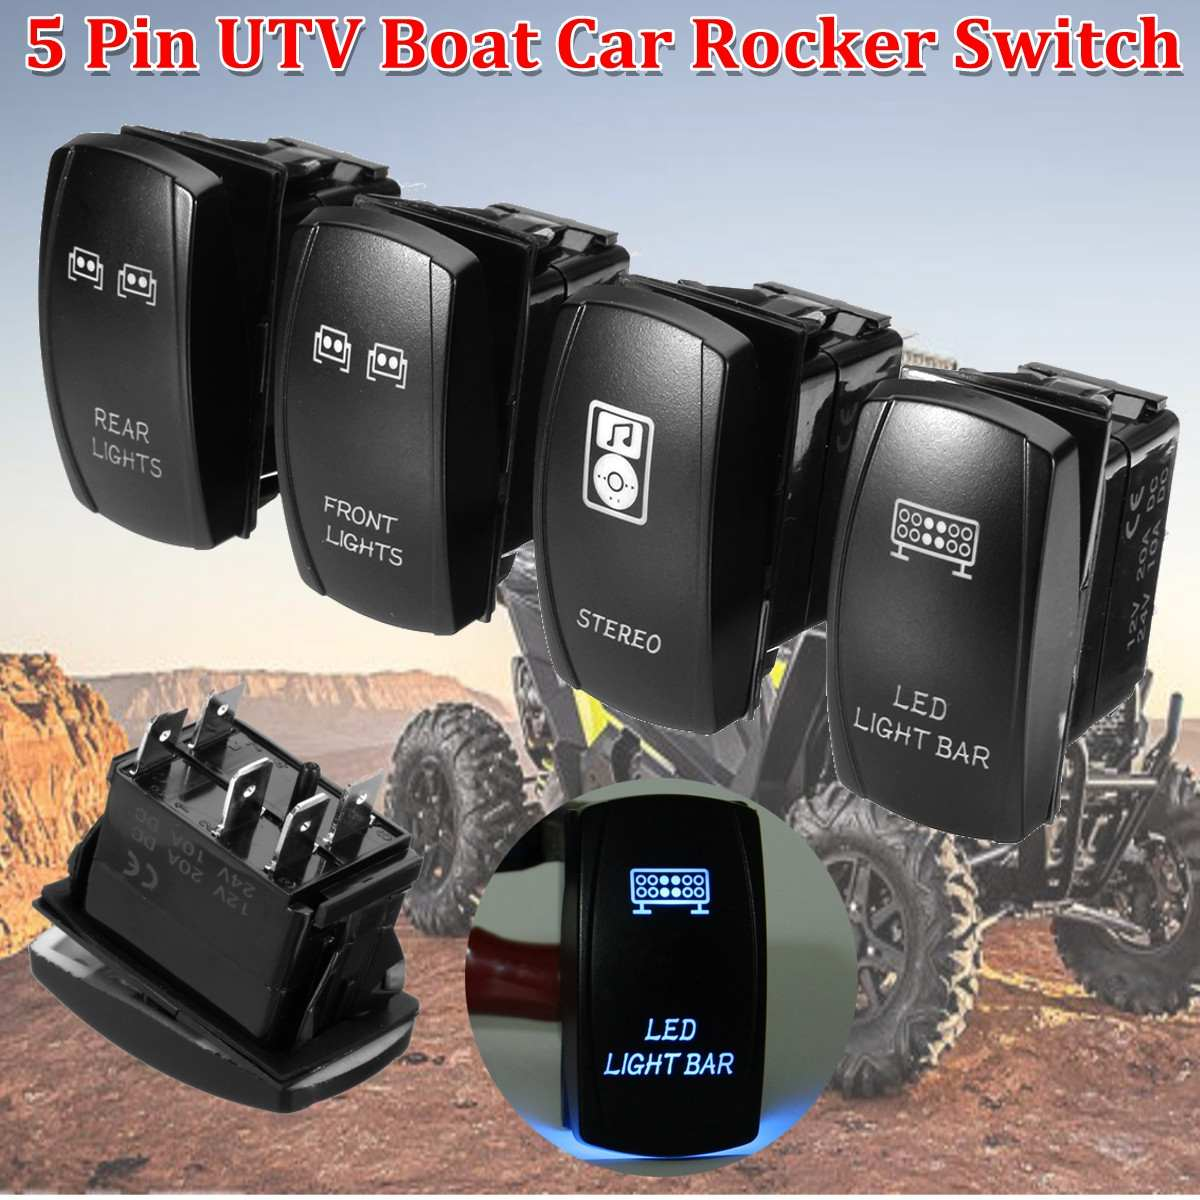 Red AWNING LIGHTS Rocker 12V Toggle Switch For UTV POLARIS RZR 4 XP 900 1000